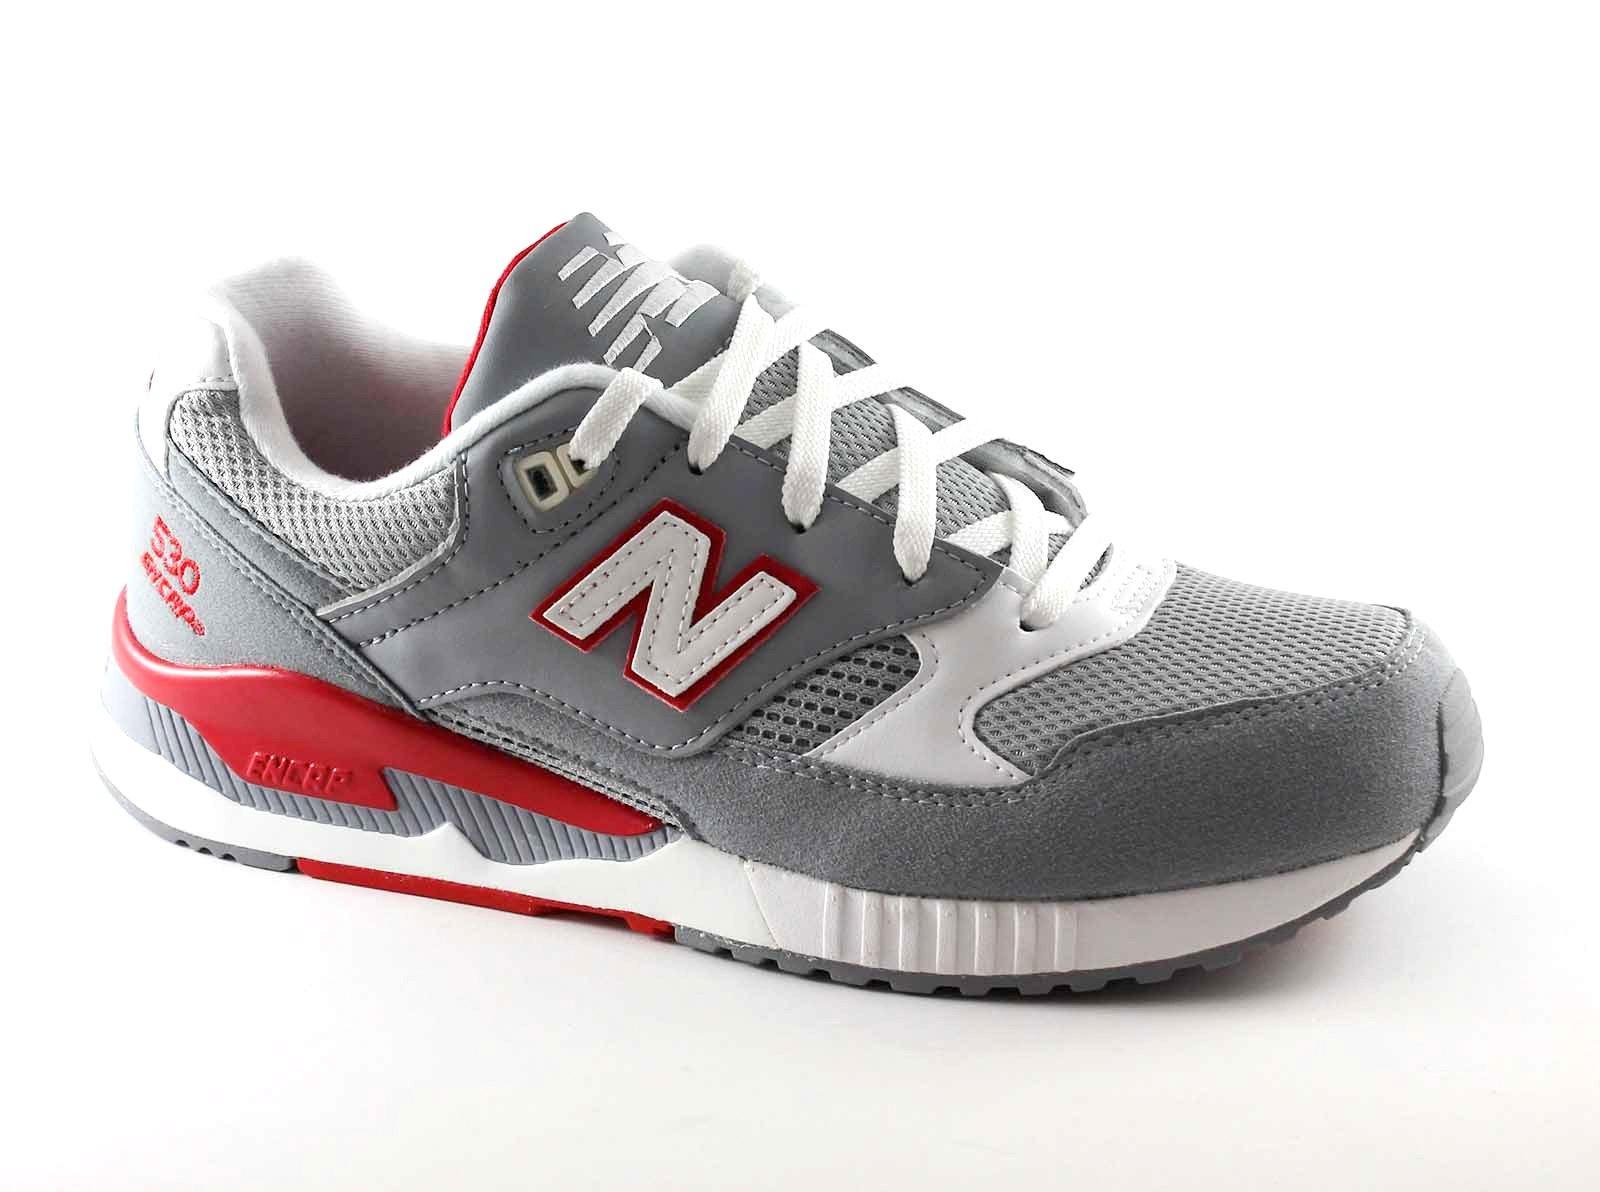 NEW BALANCE M530 CVB grigio bianco running scarpe uomo sneakers lacci